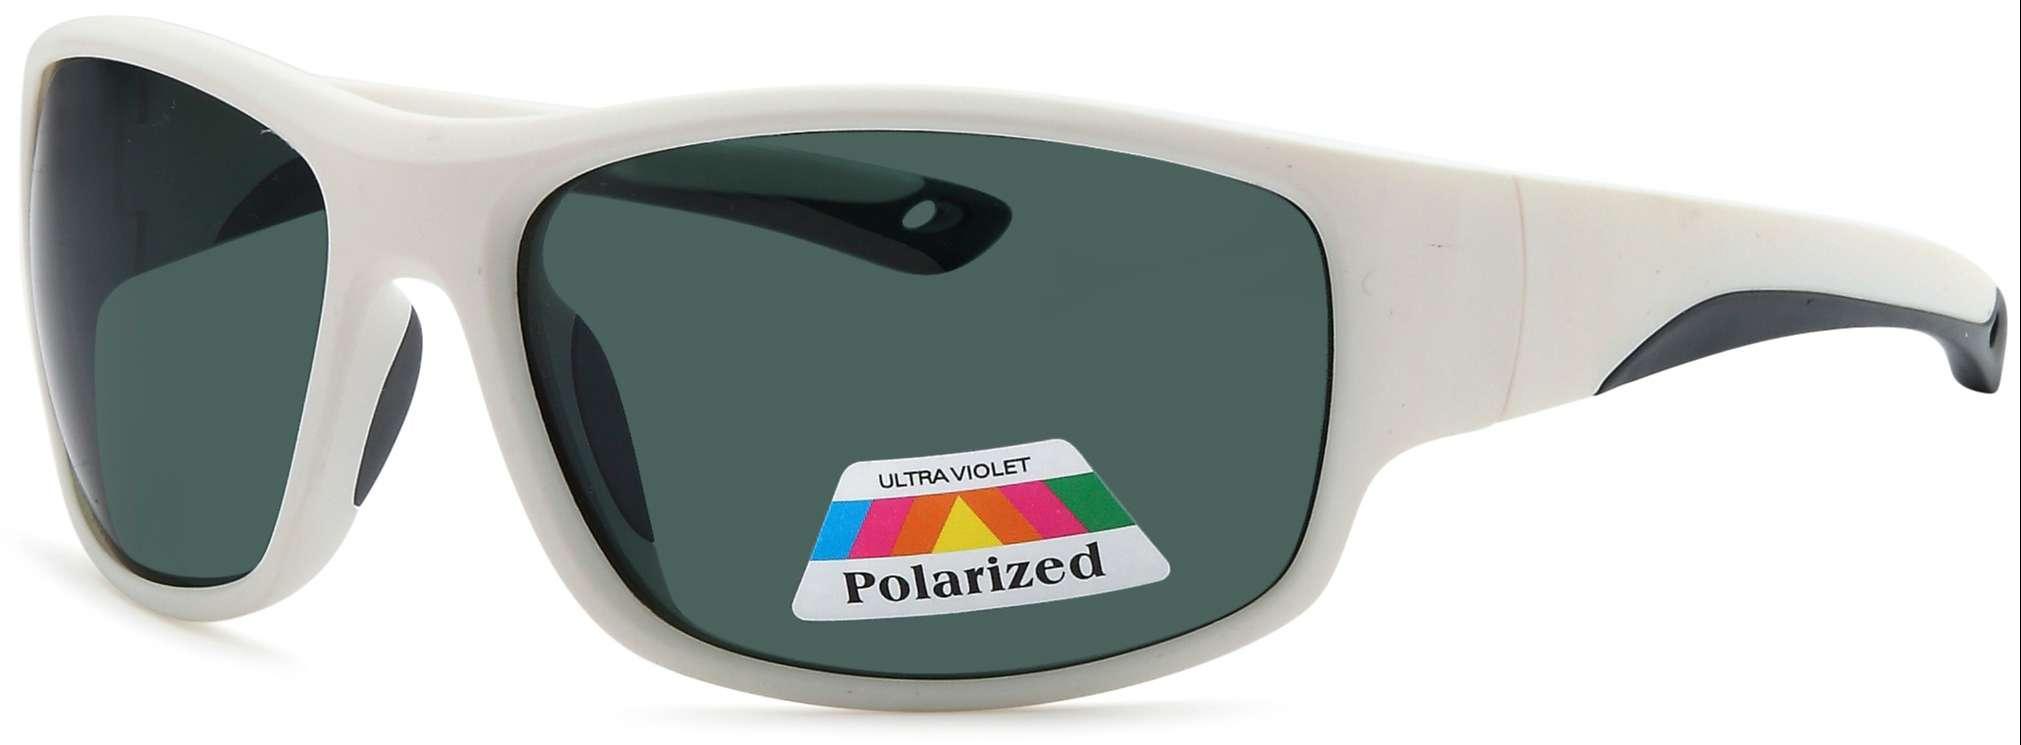 white frame polarized sunglasses